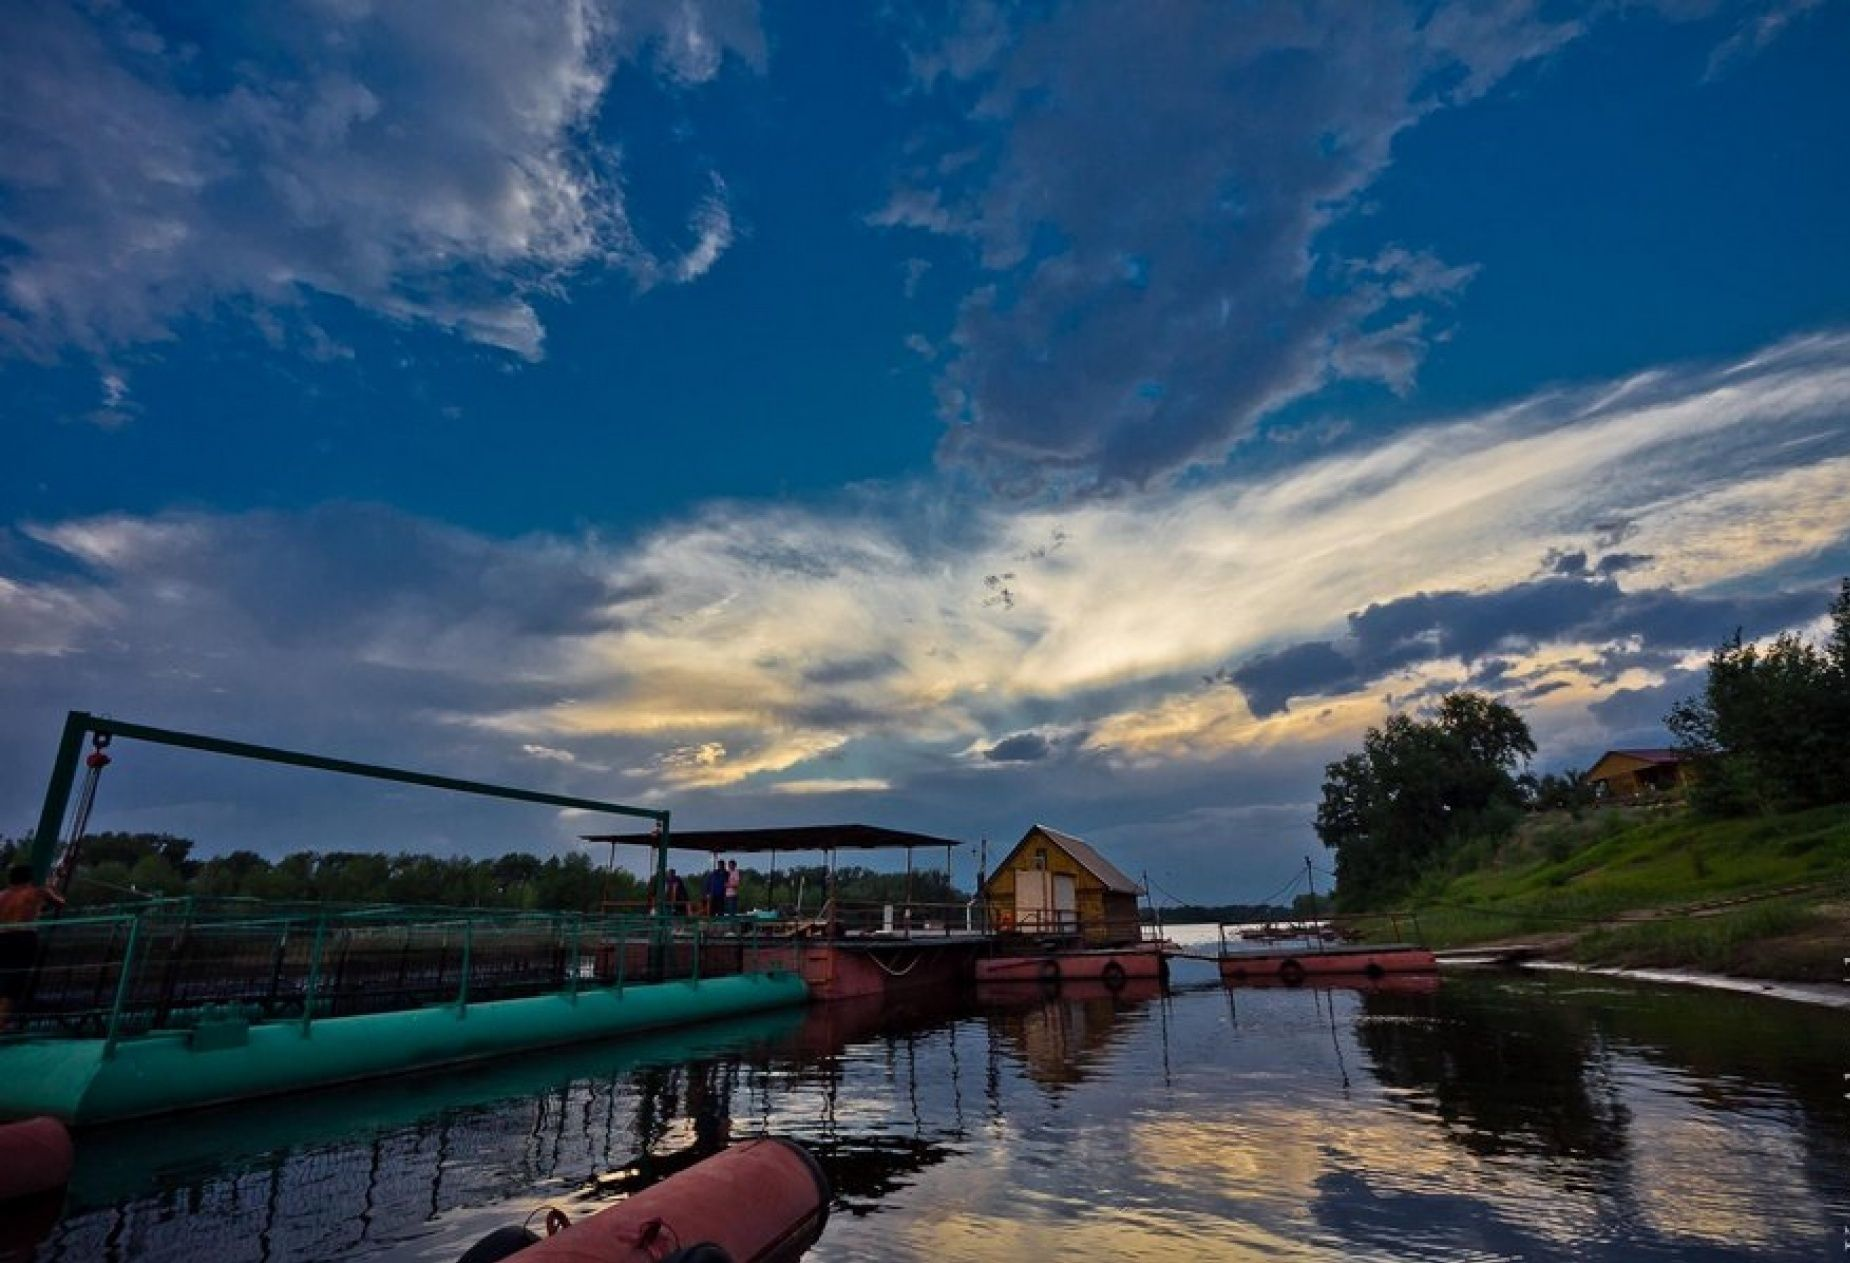 River club «Летучая рыба» Волгоградская область, фото 5